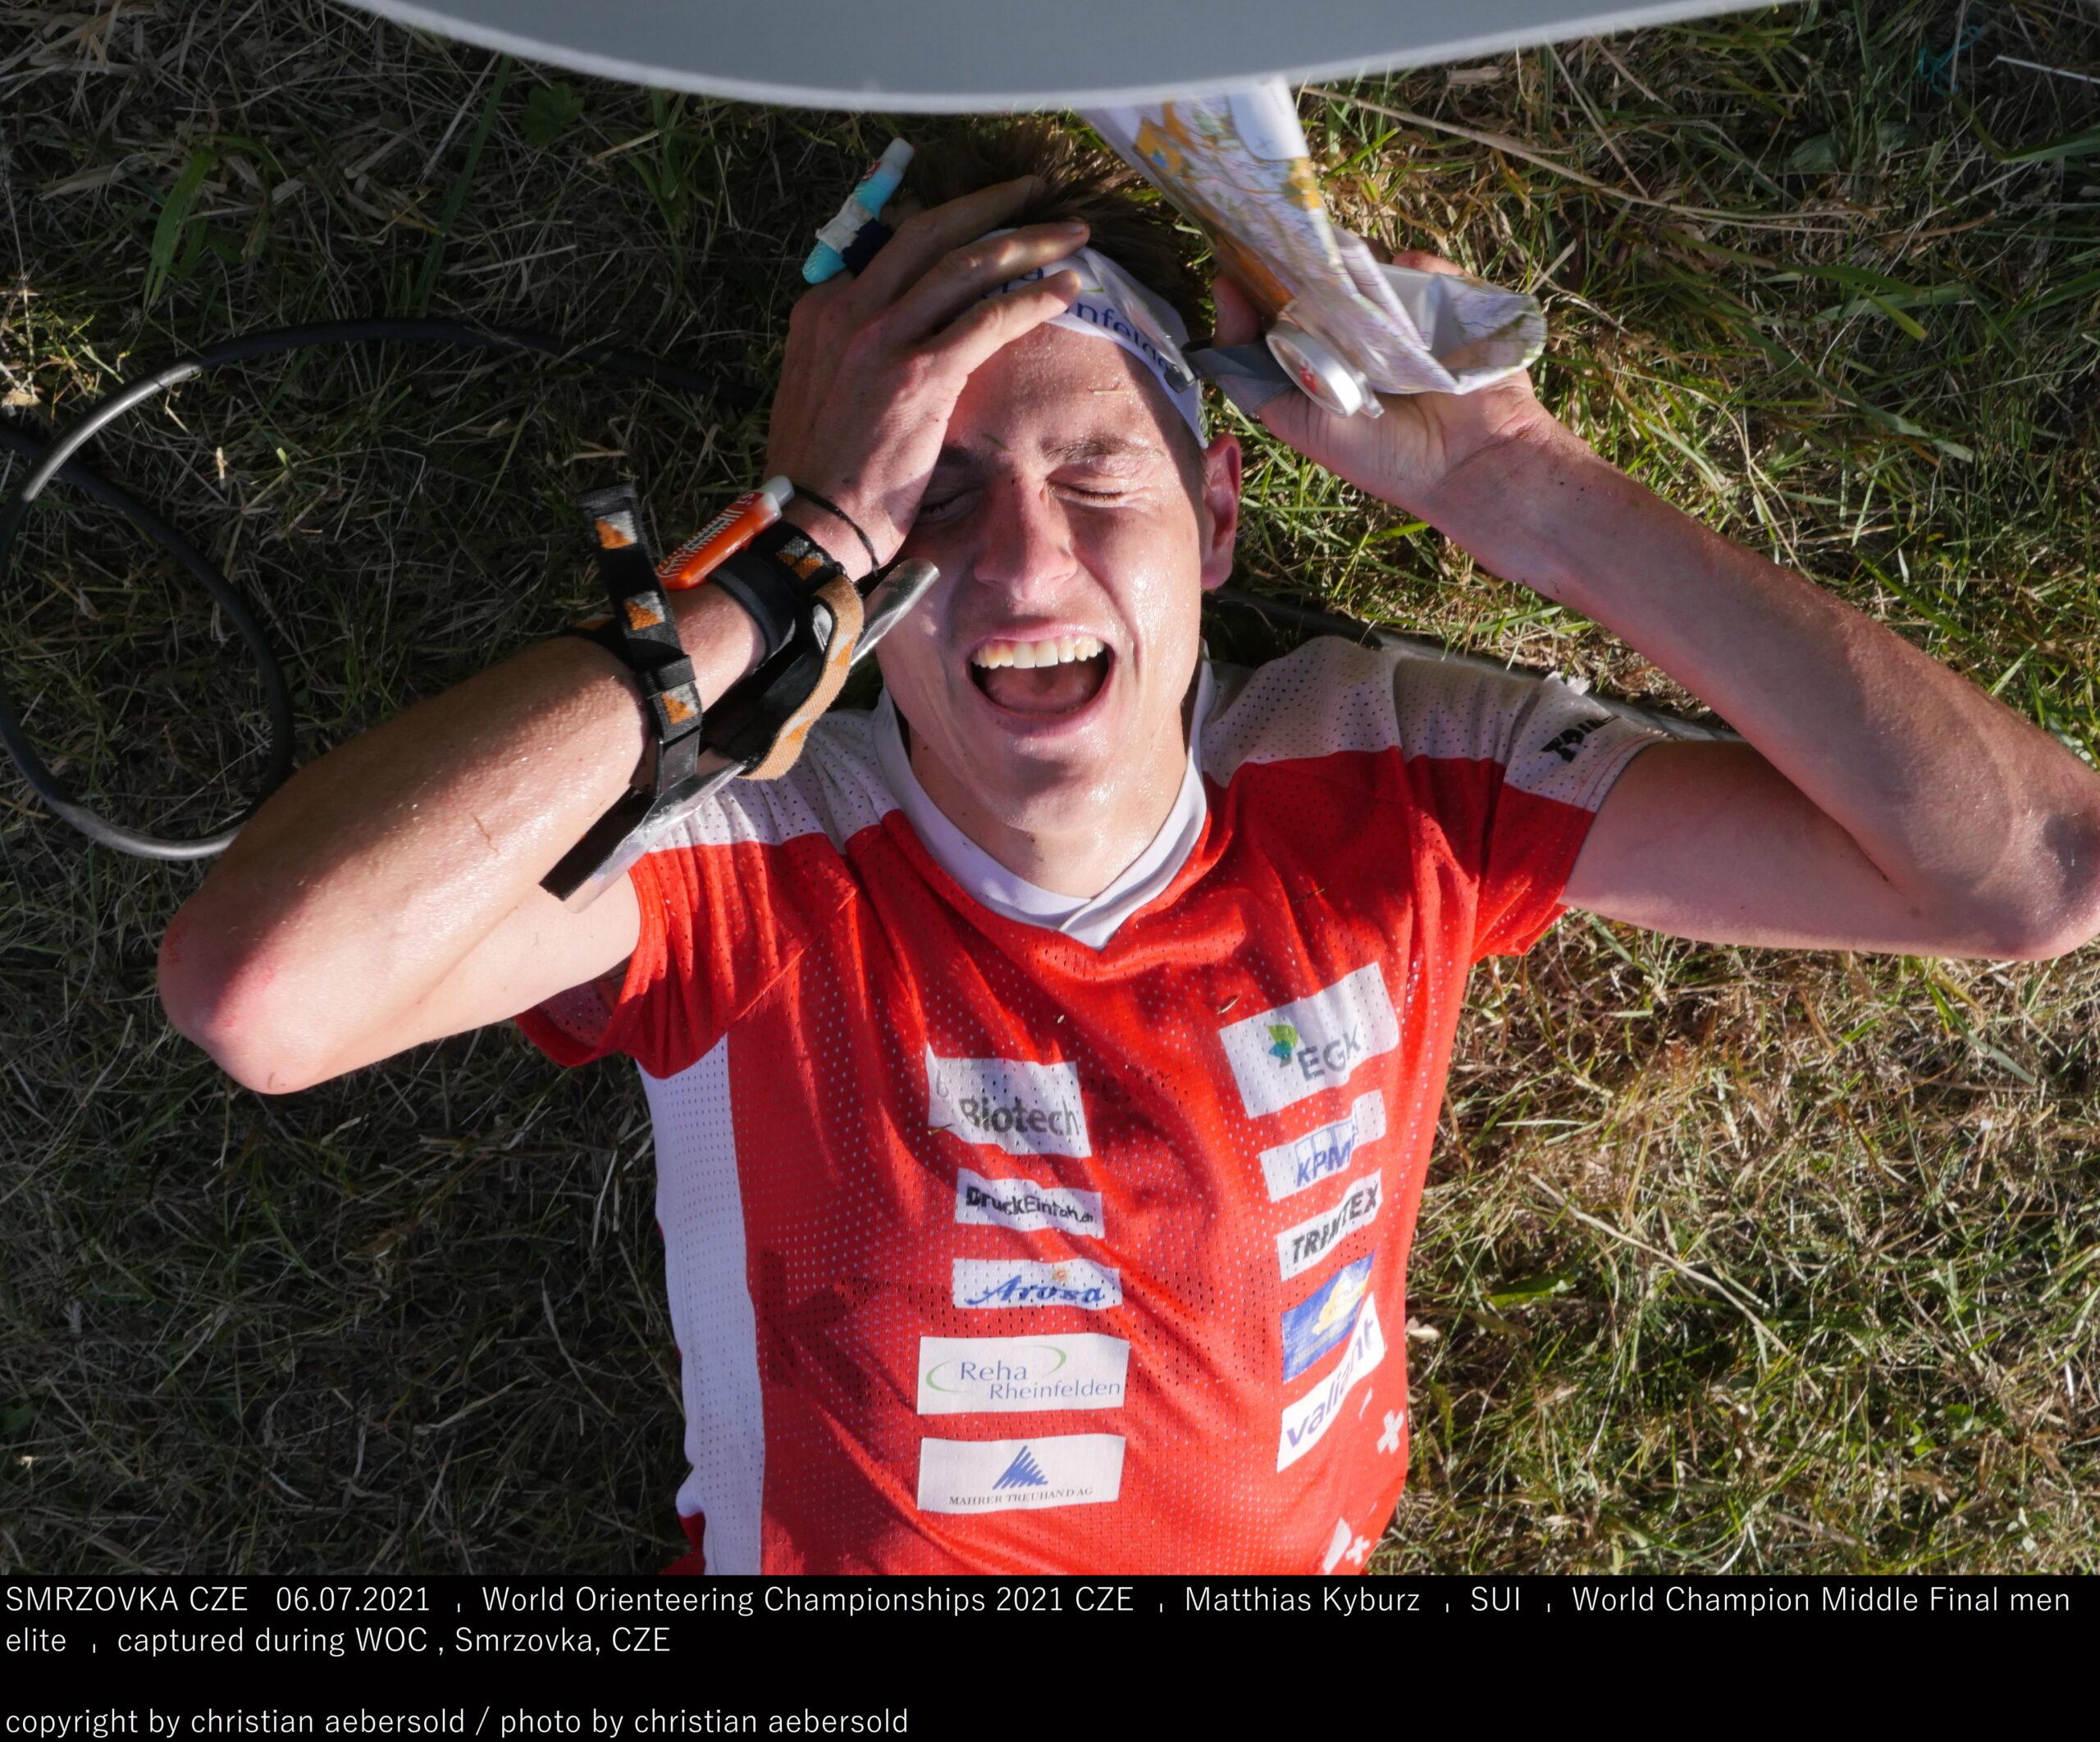 World Orienteering Championships 2021 CZE